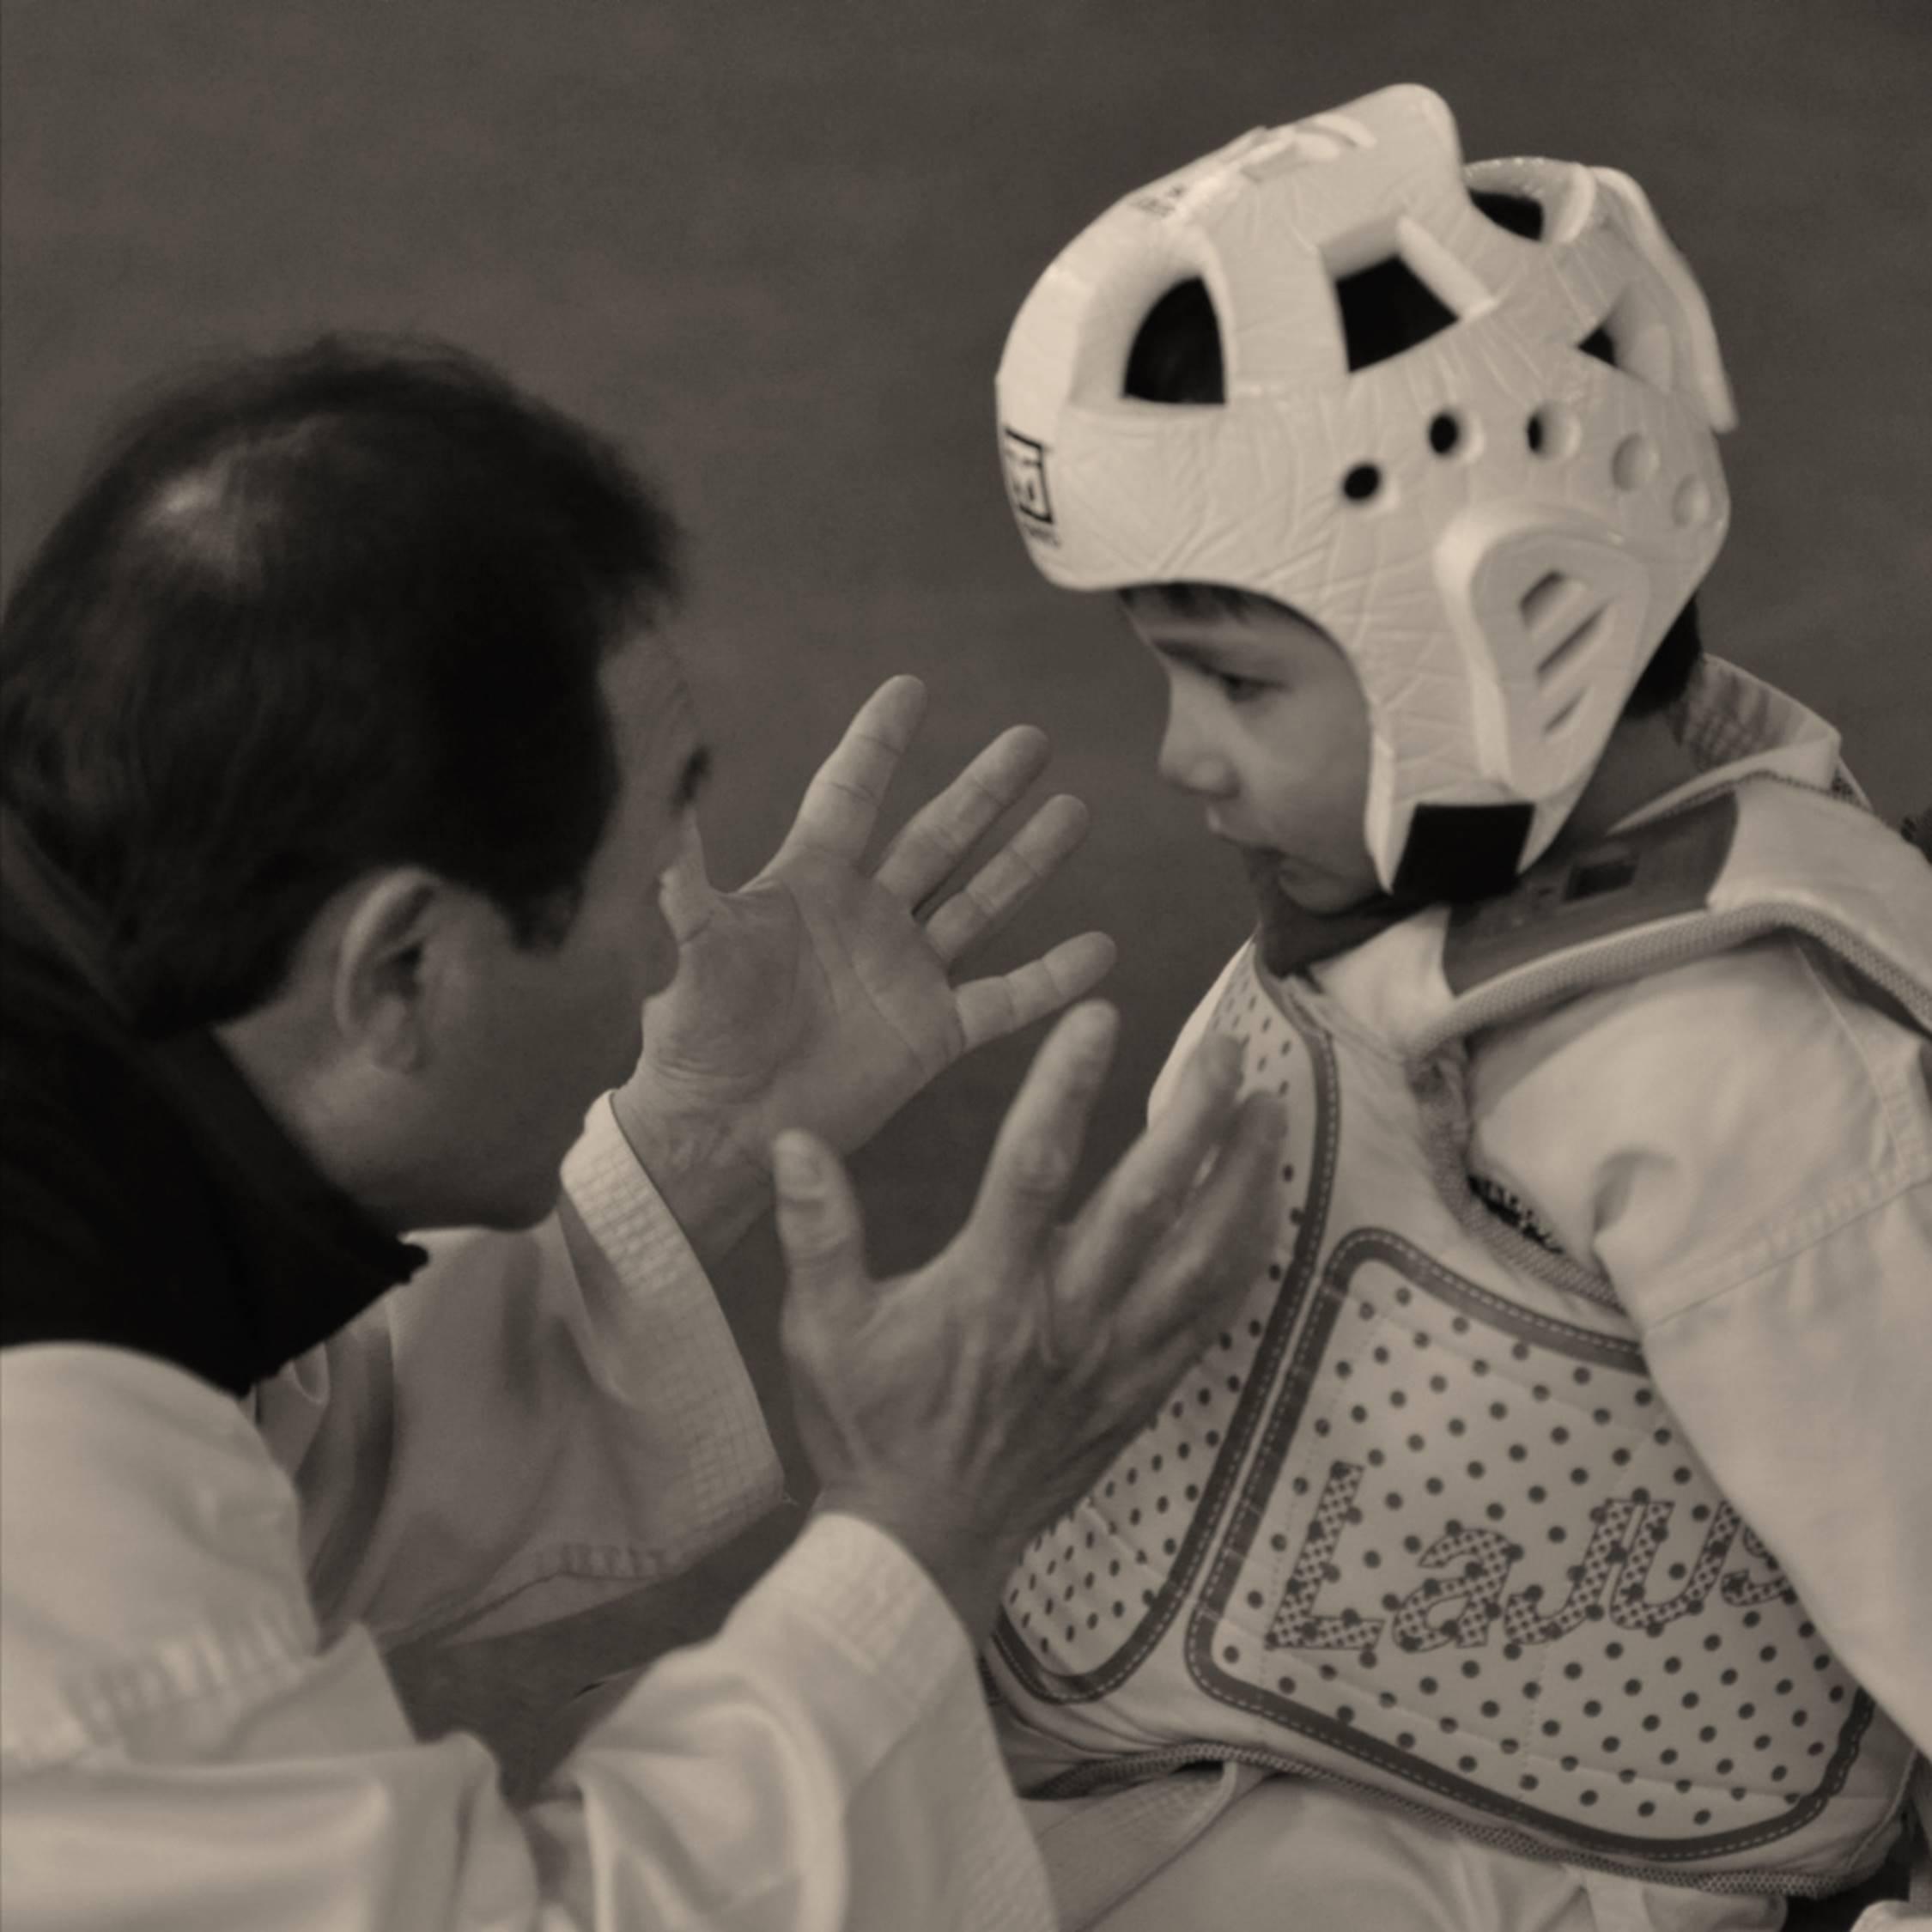 Taekwondo Quotes Joon No's Taekwondo